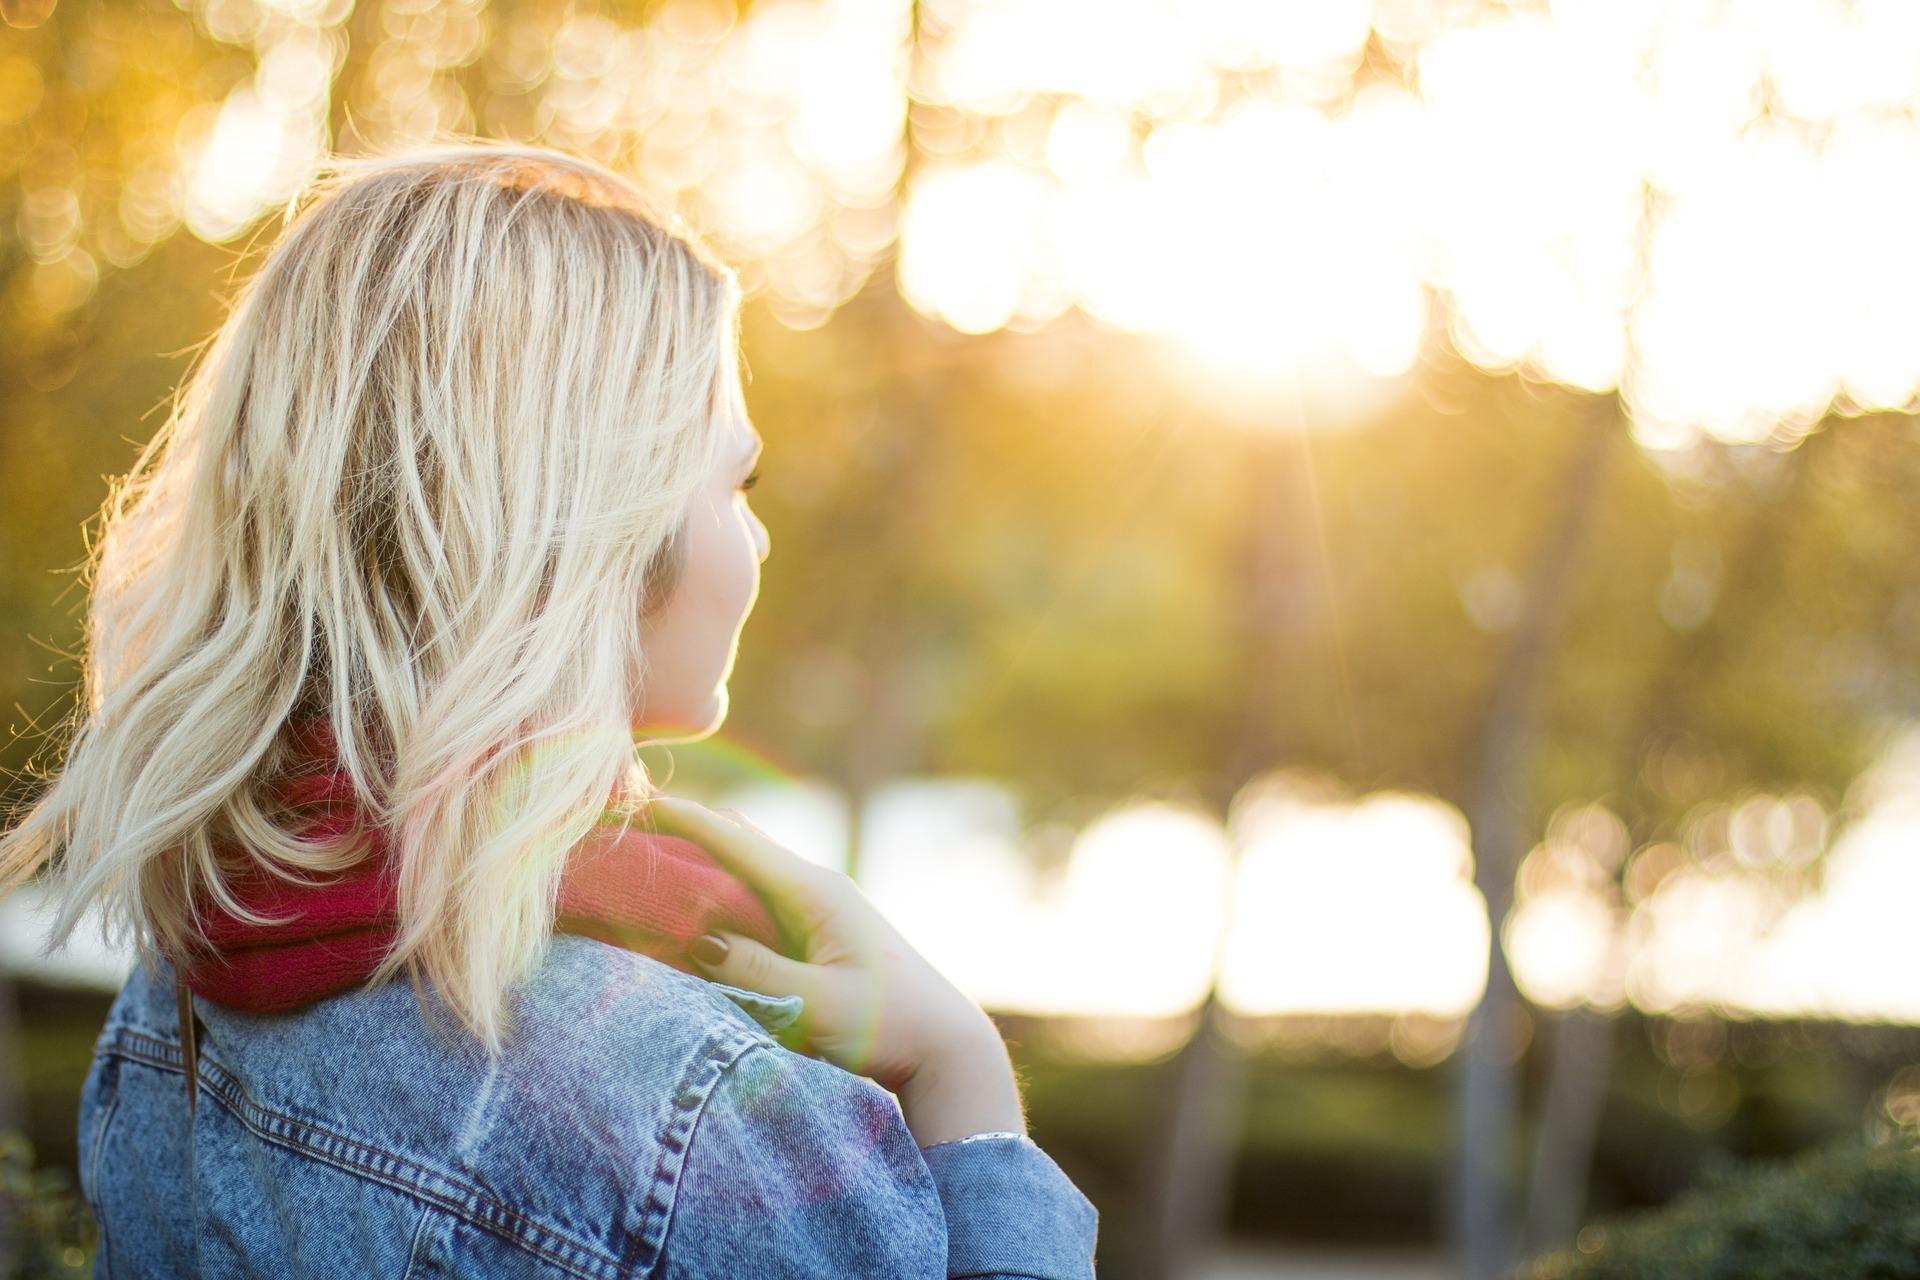 Blonde woman facing sunset outside